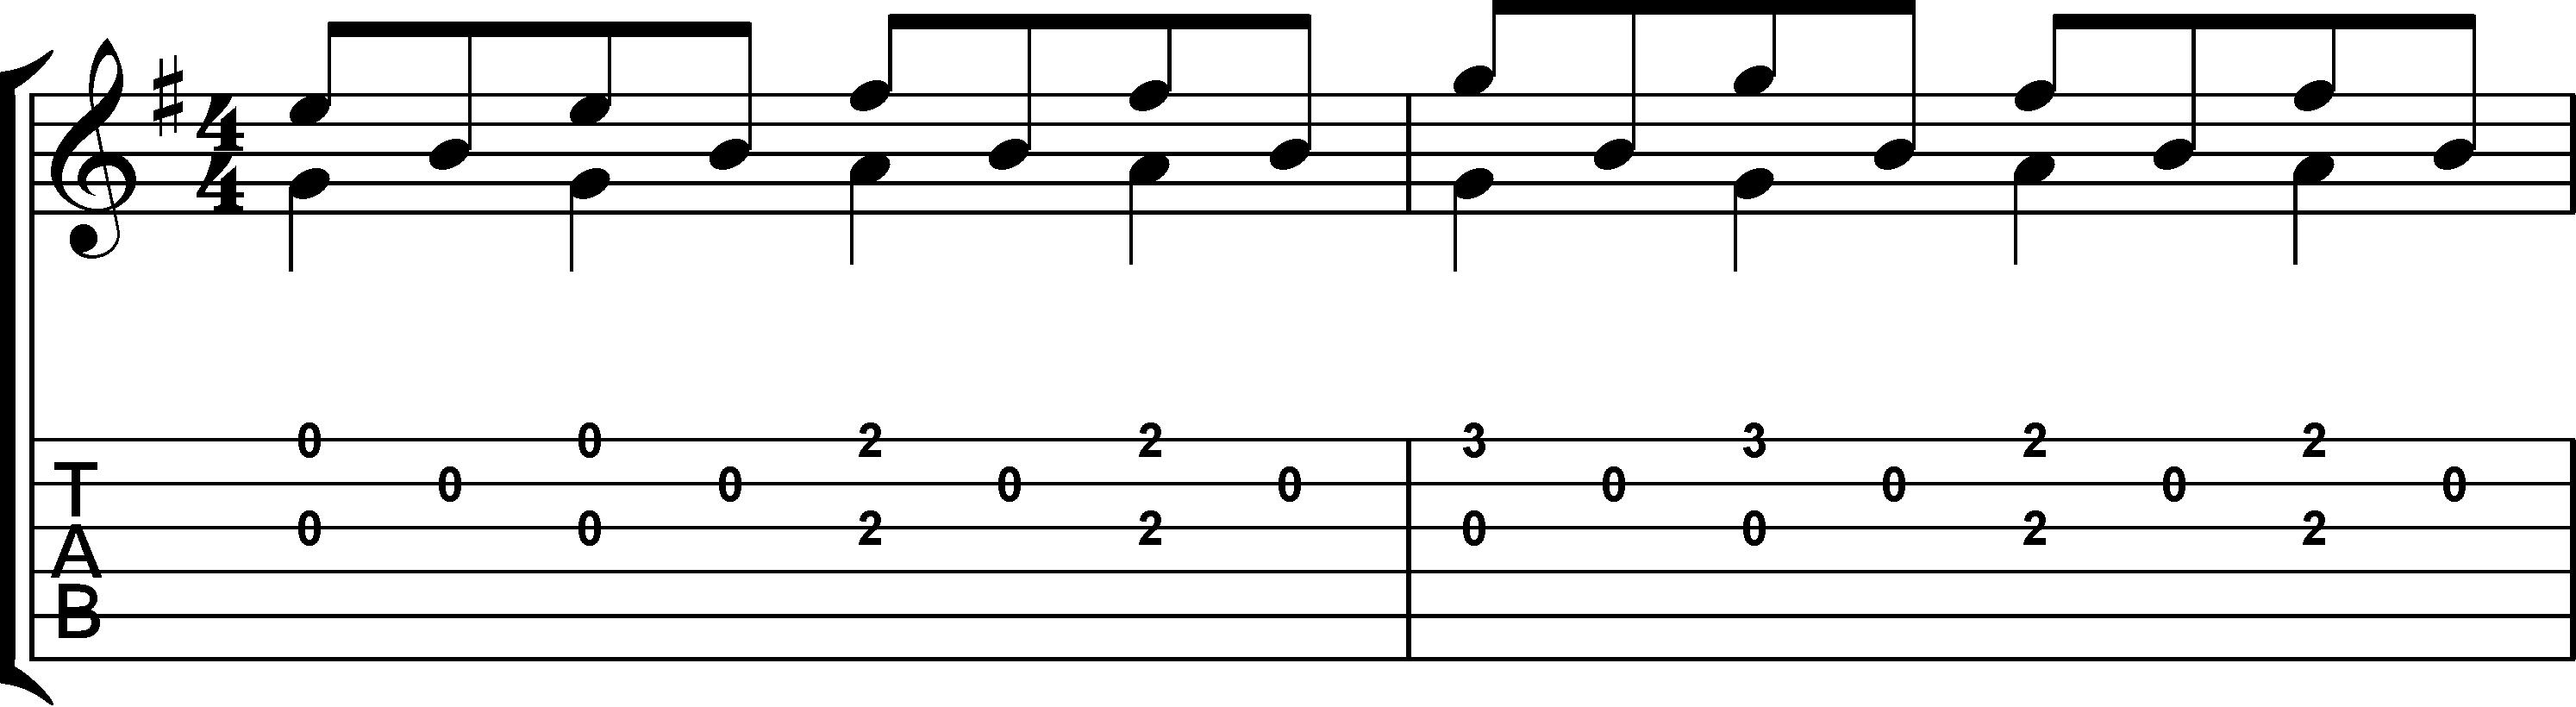 Andandino para guitarra partitura + tablatura 1